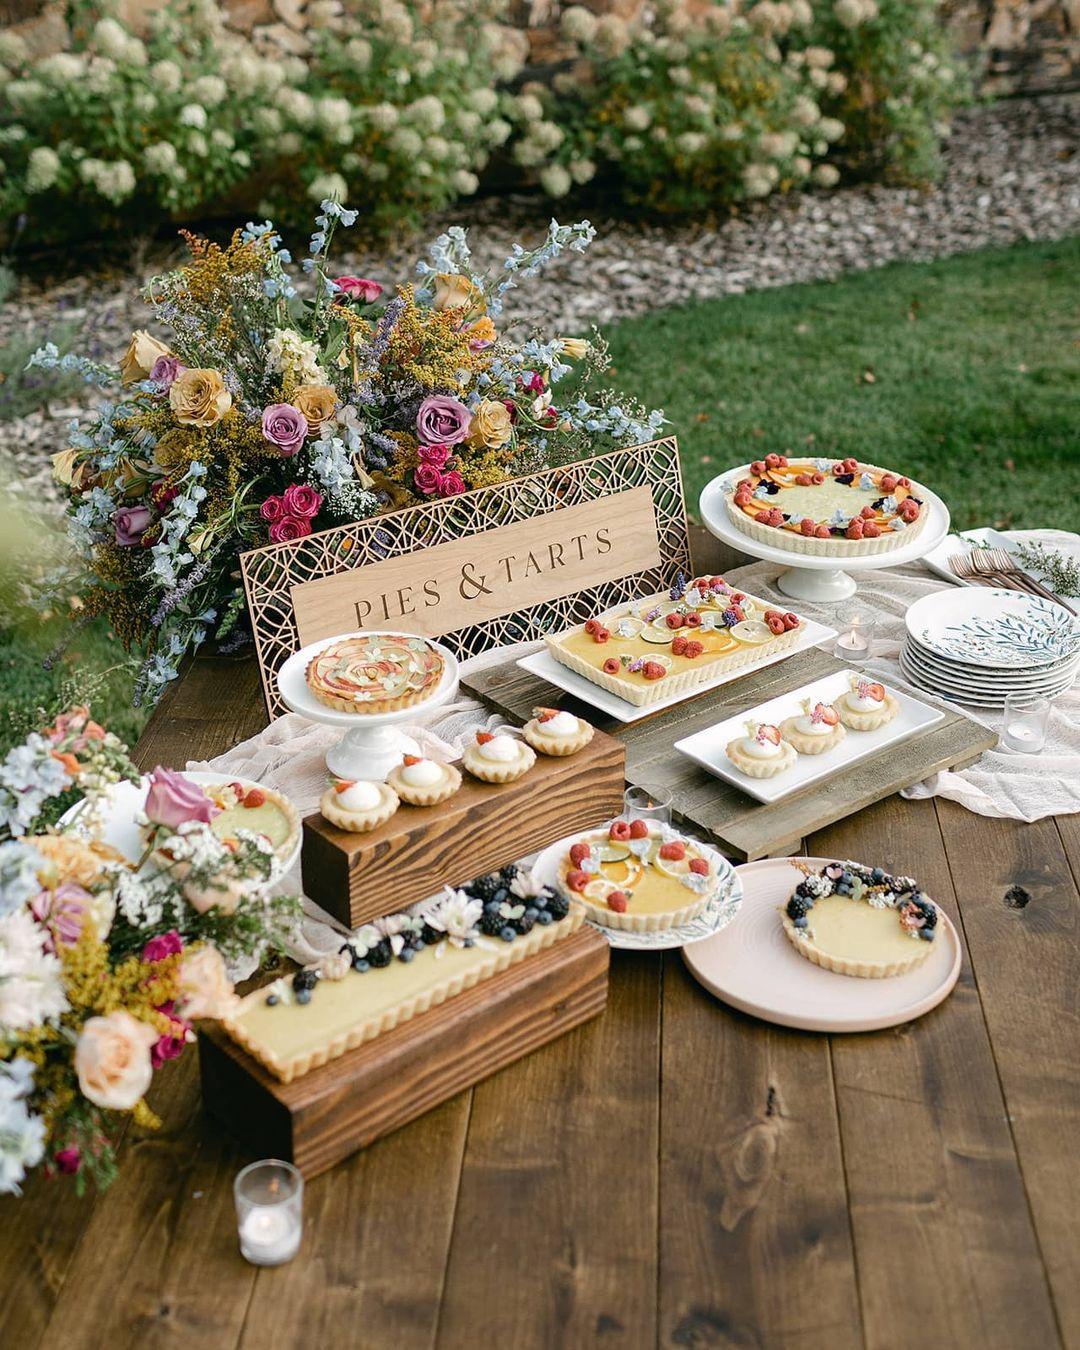 pie and tart wedding dessert table